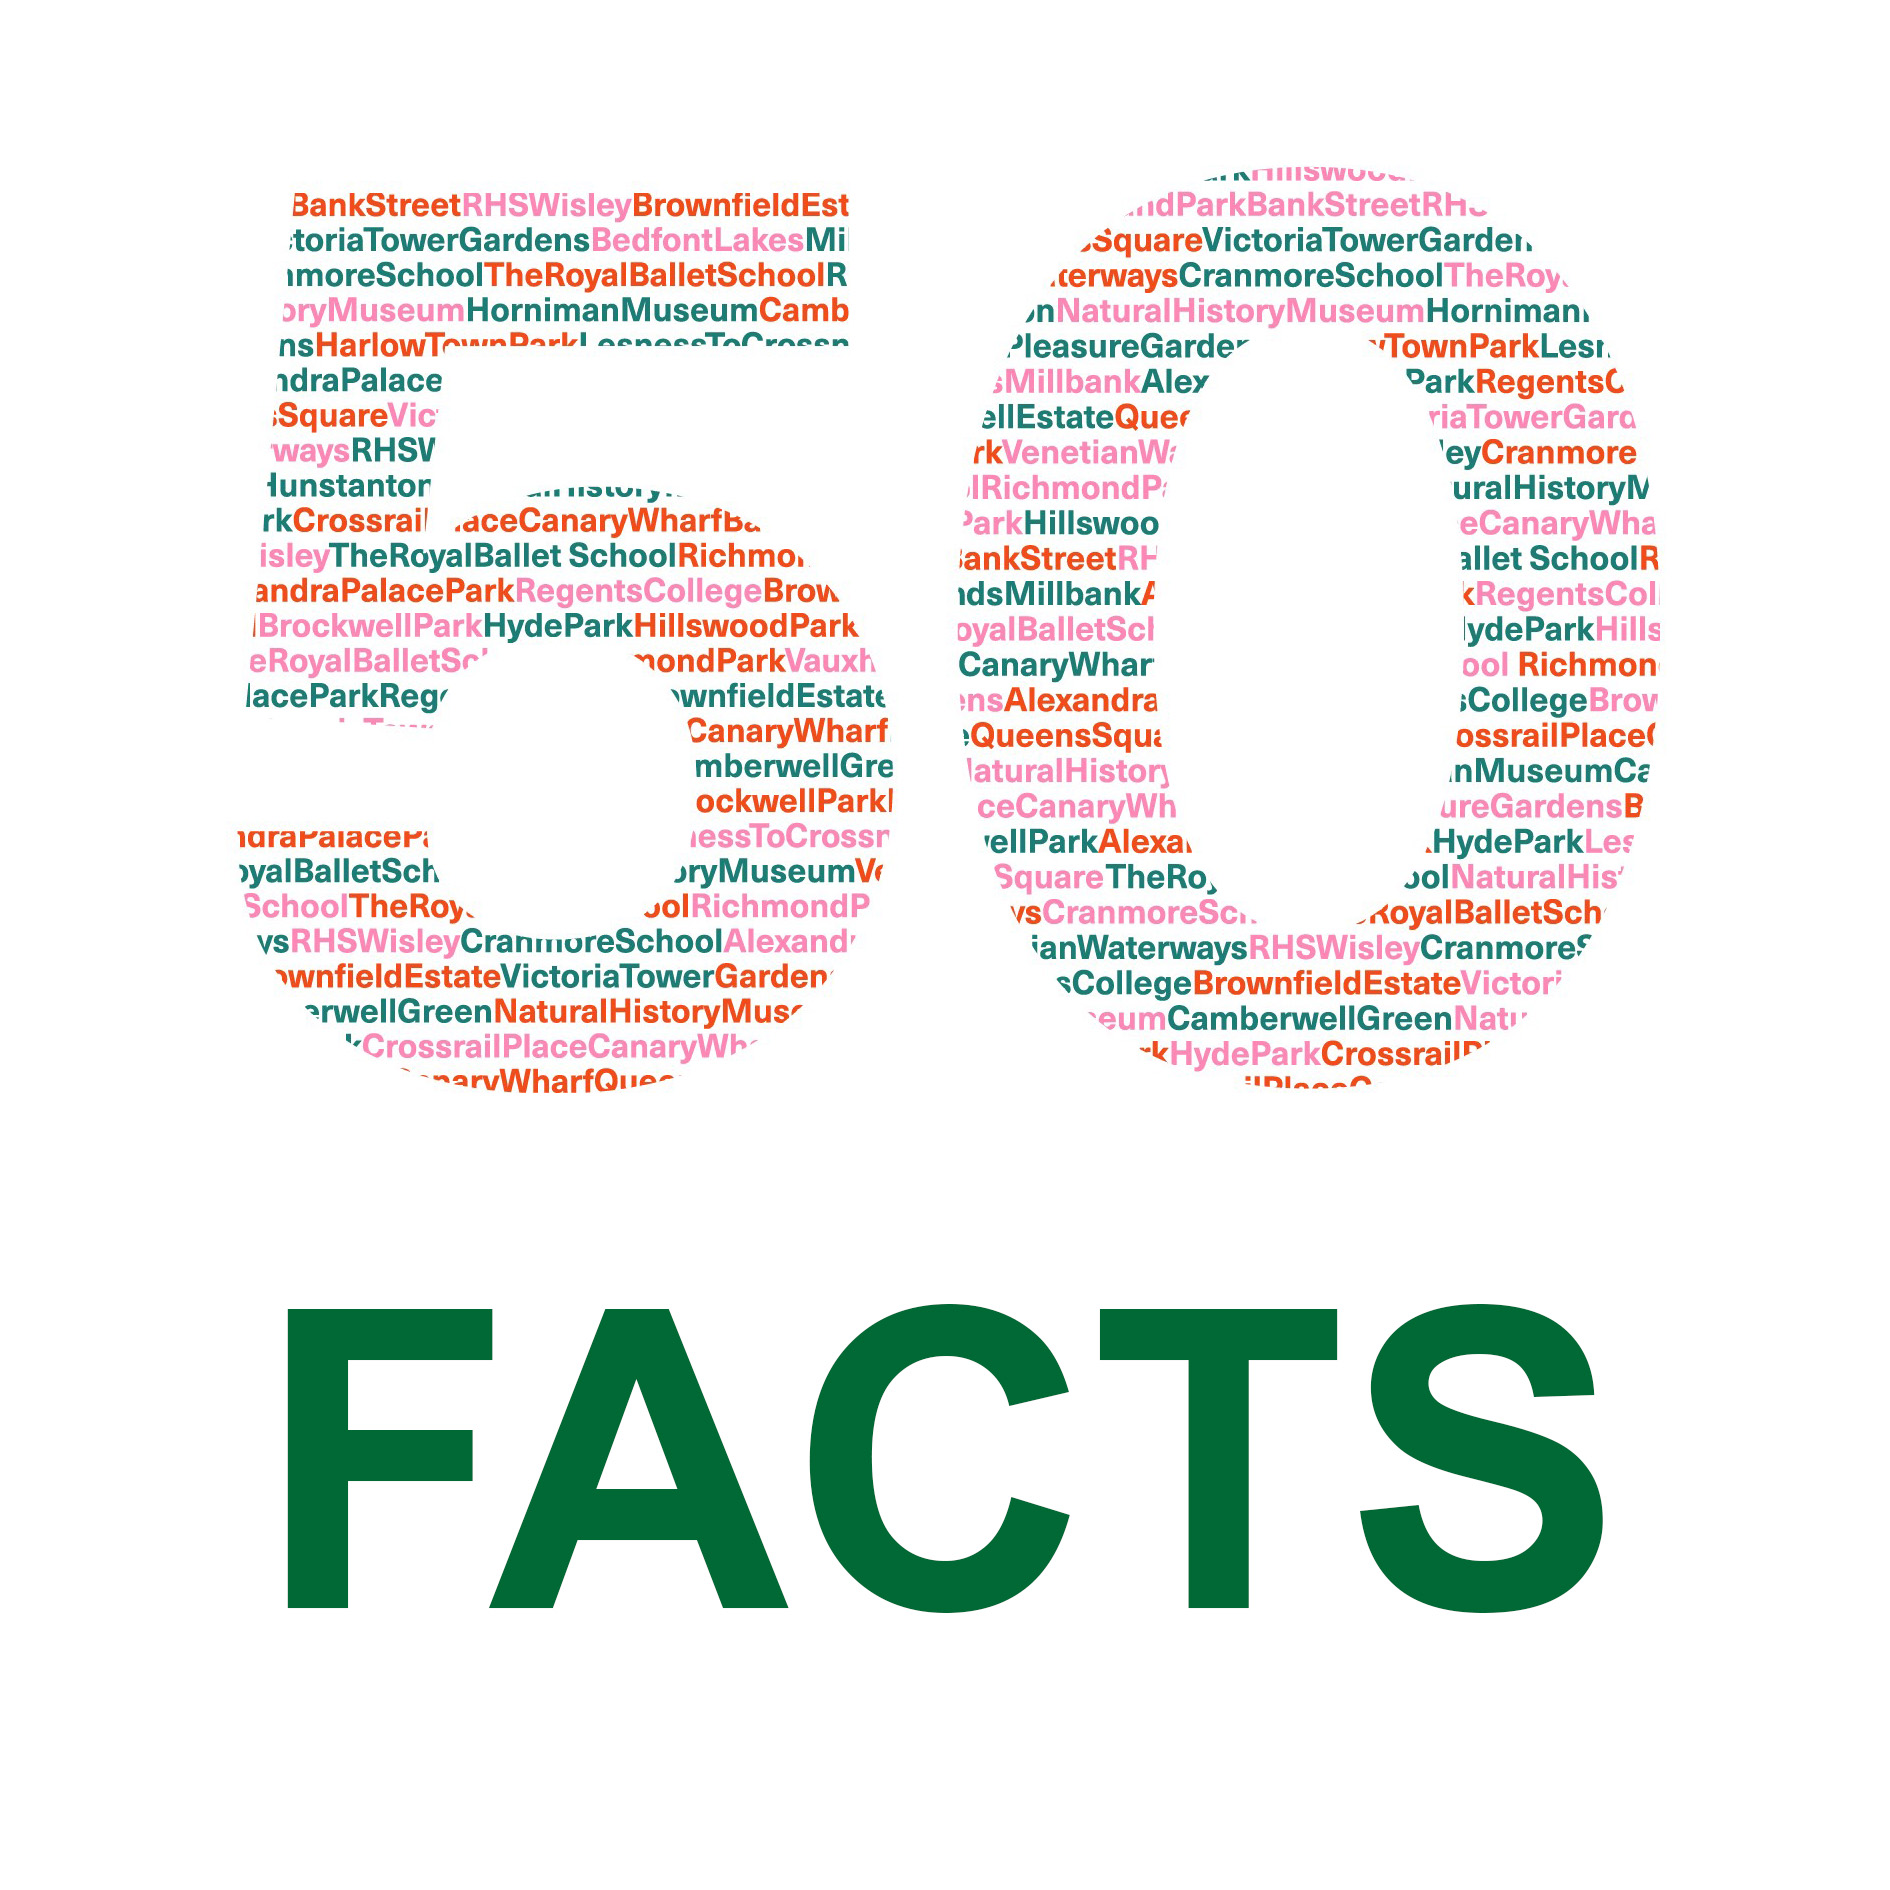 50 facts image.jpg